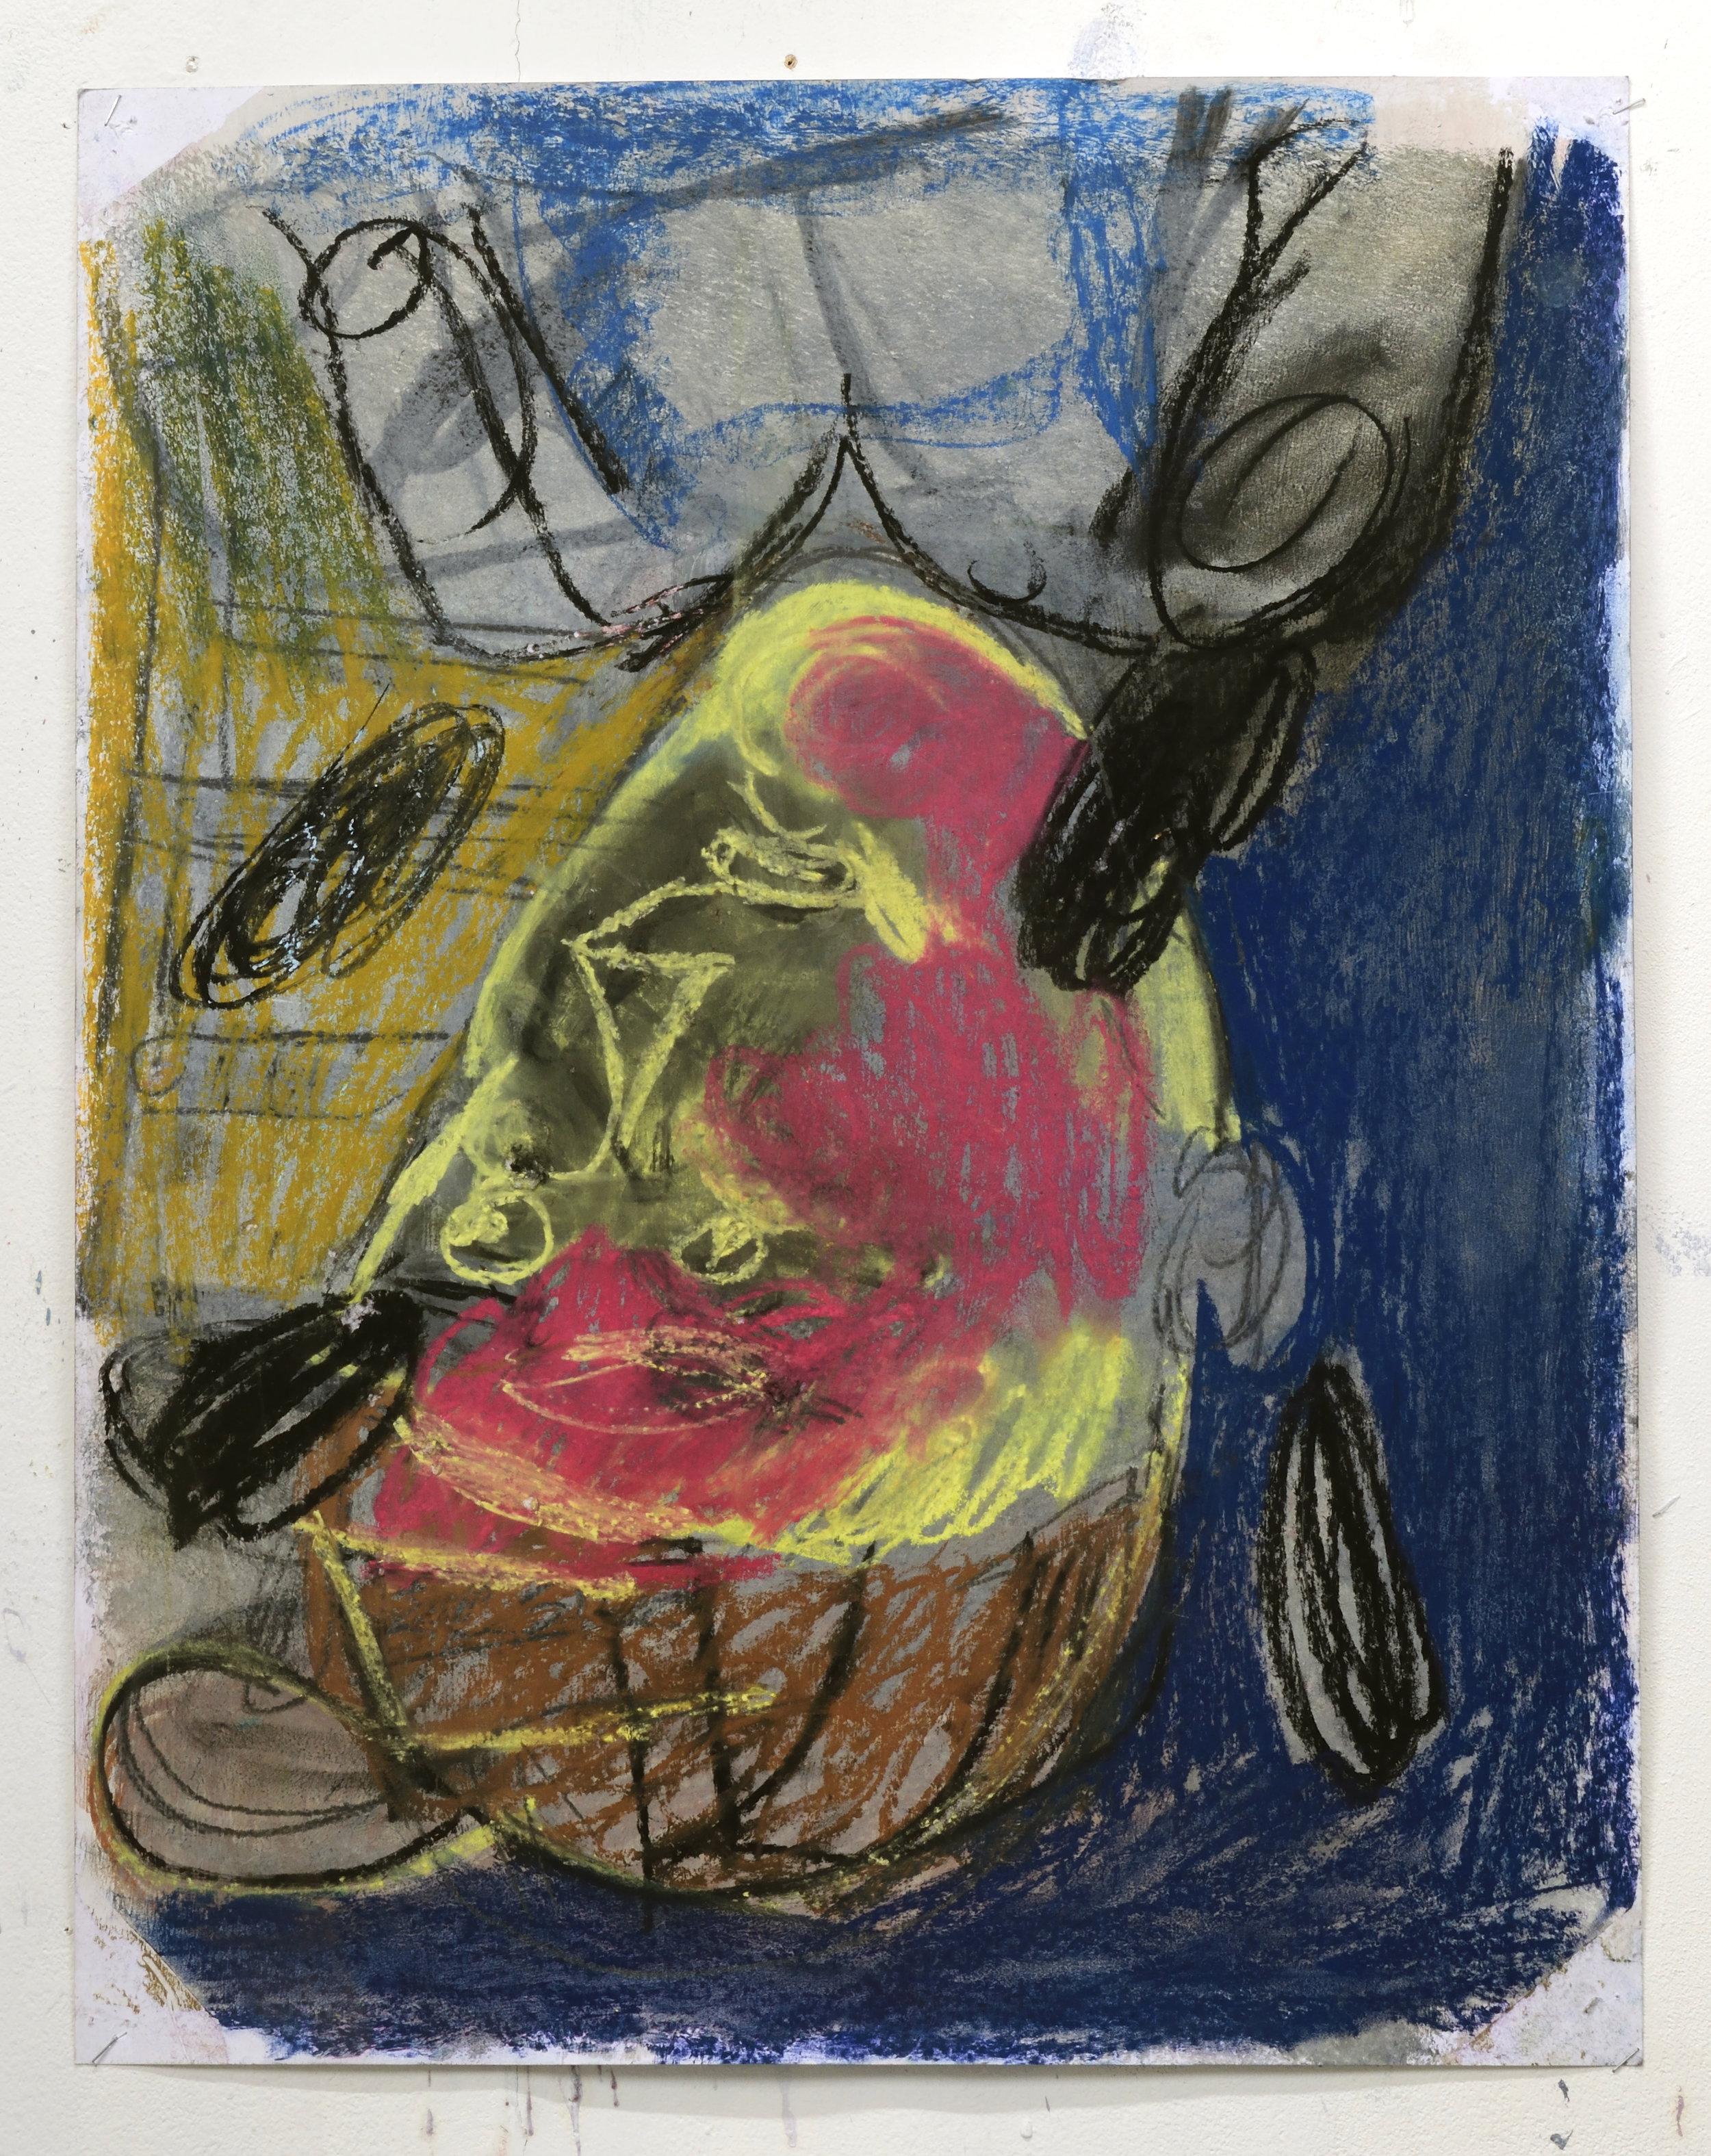 'Servant' 2018    Pastel on paper. 64.7 x 51 cm